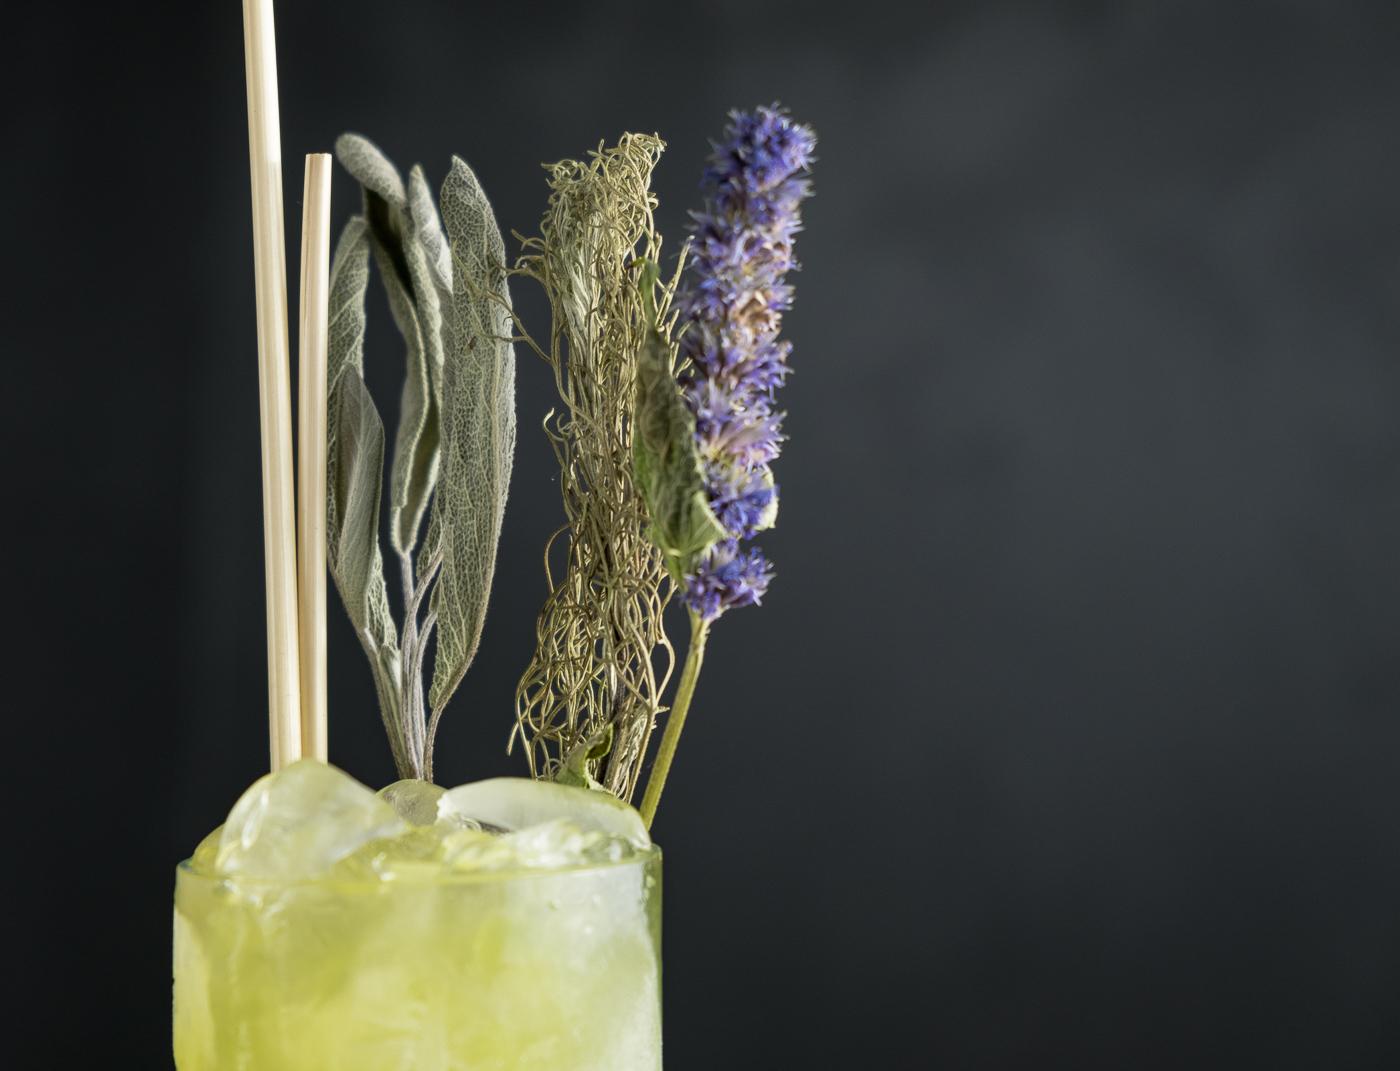 tooktook-photography-gastronomy-food-beverages-experiences-restaurants-122.jpg